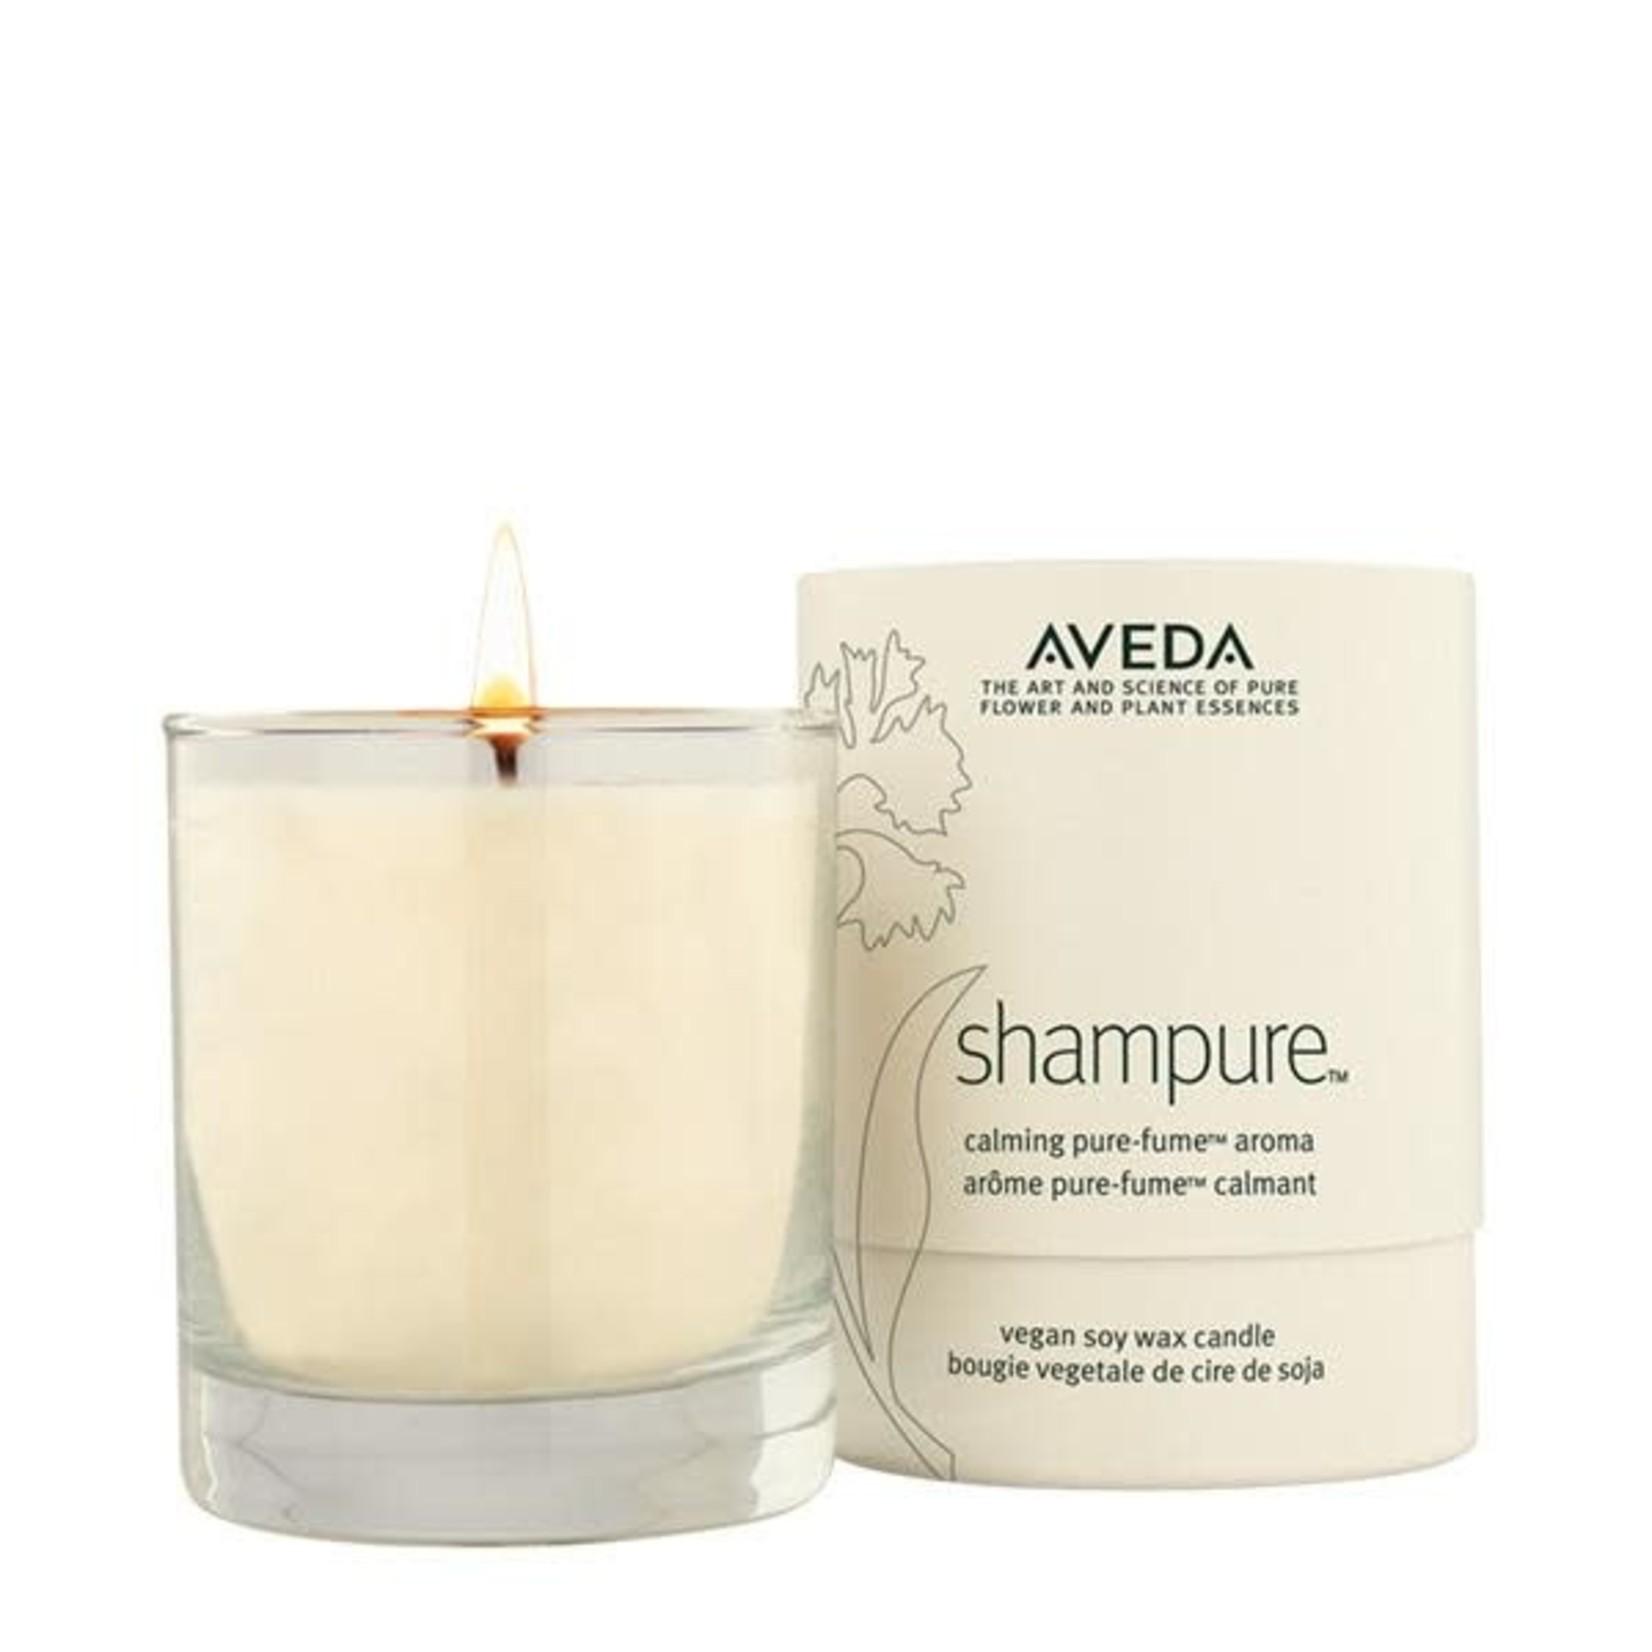 AVEDA Shampure Vegan Soy Wax Candle